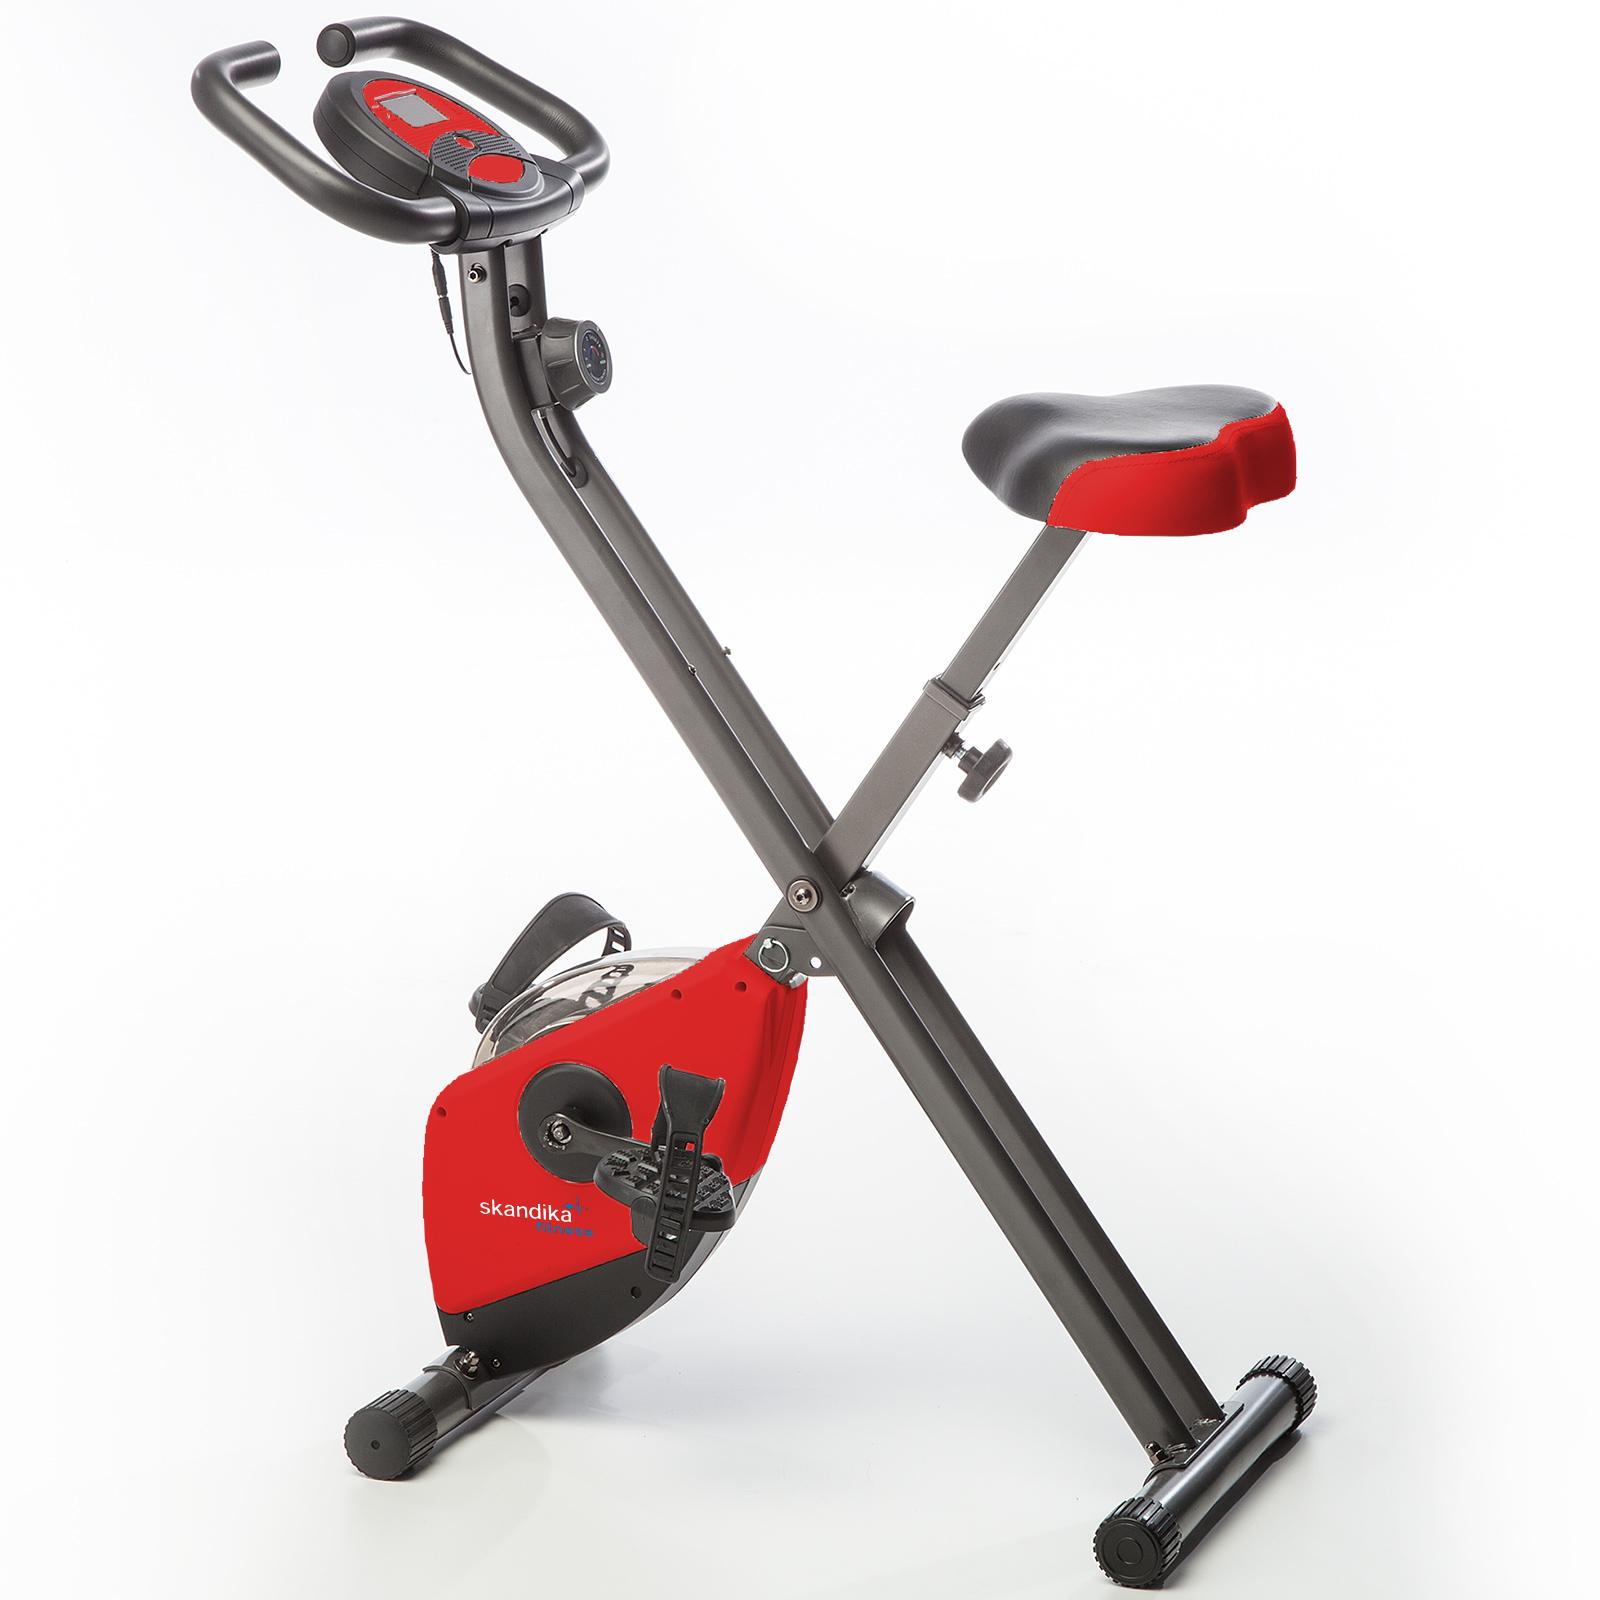 Skandika Foldaway X-1000 bicicleta estática fitness plegable 110 kg roja nueva